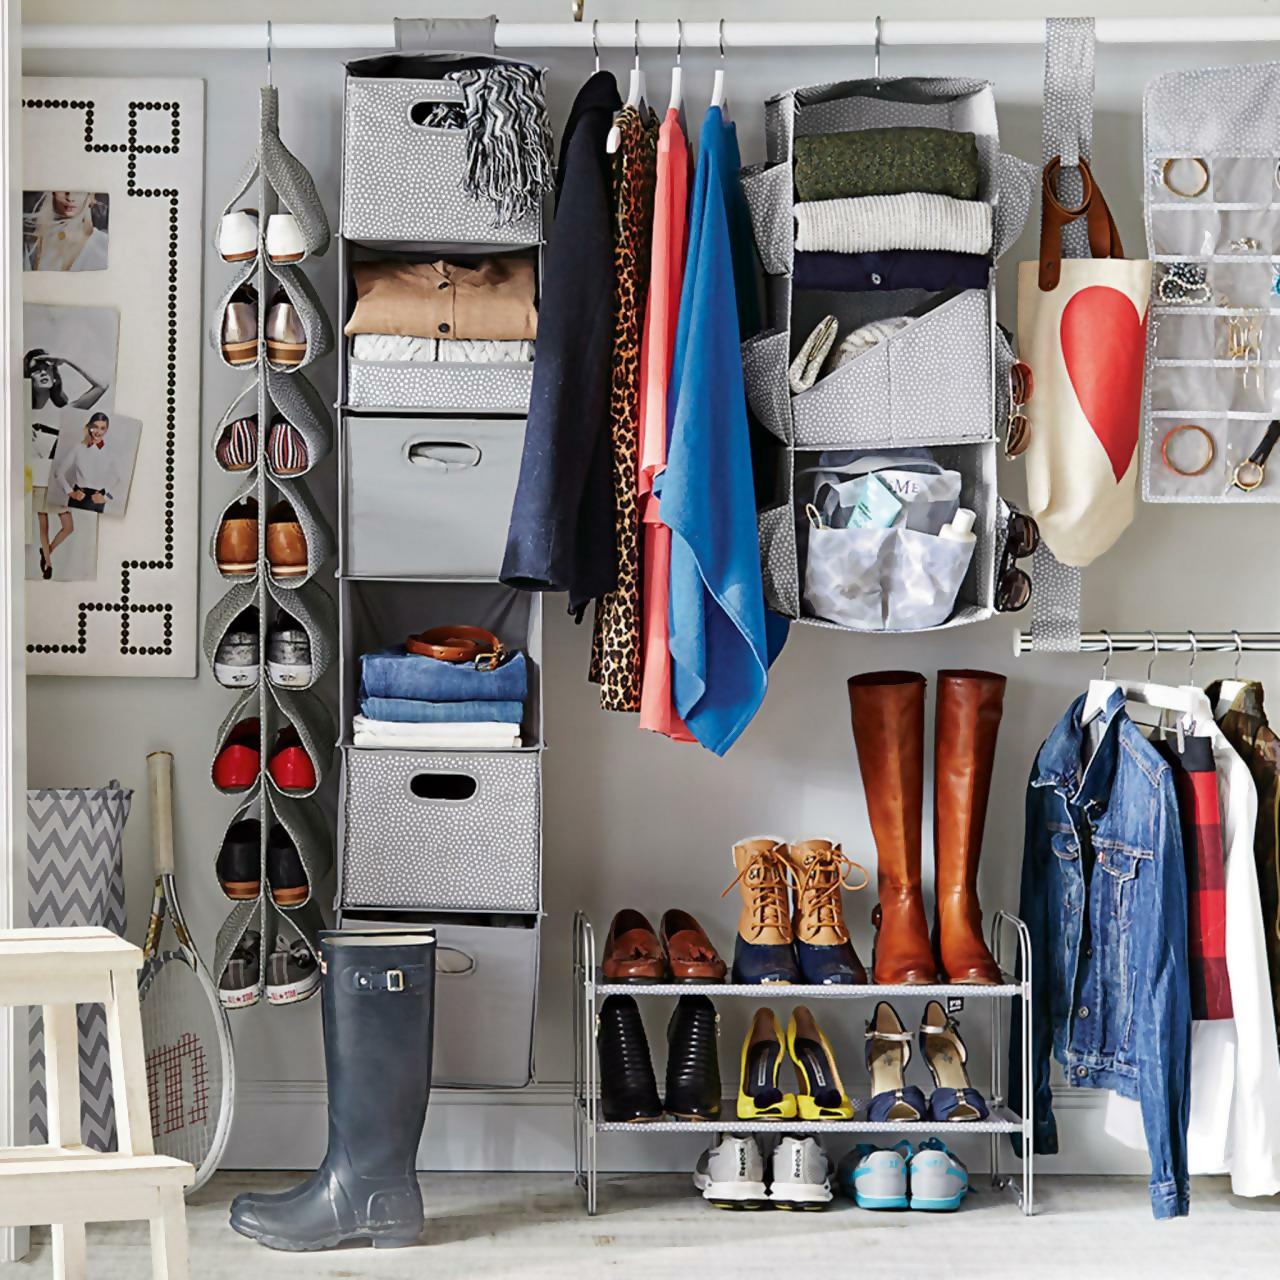 The Best Closet Organization Ideas - Interior Design Explained